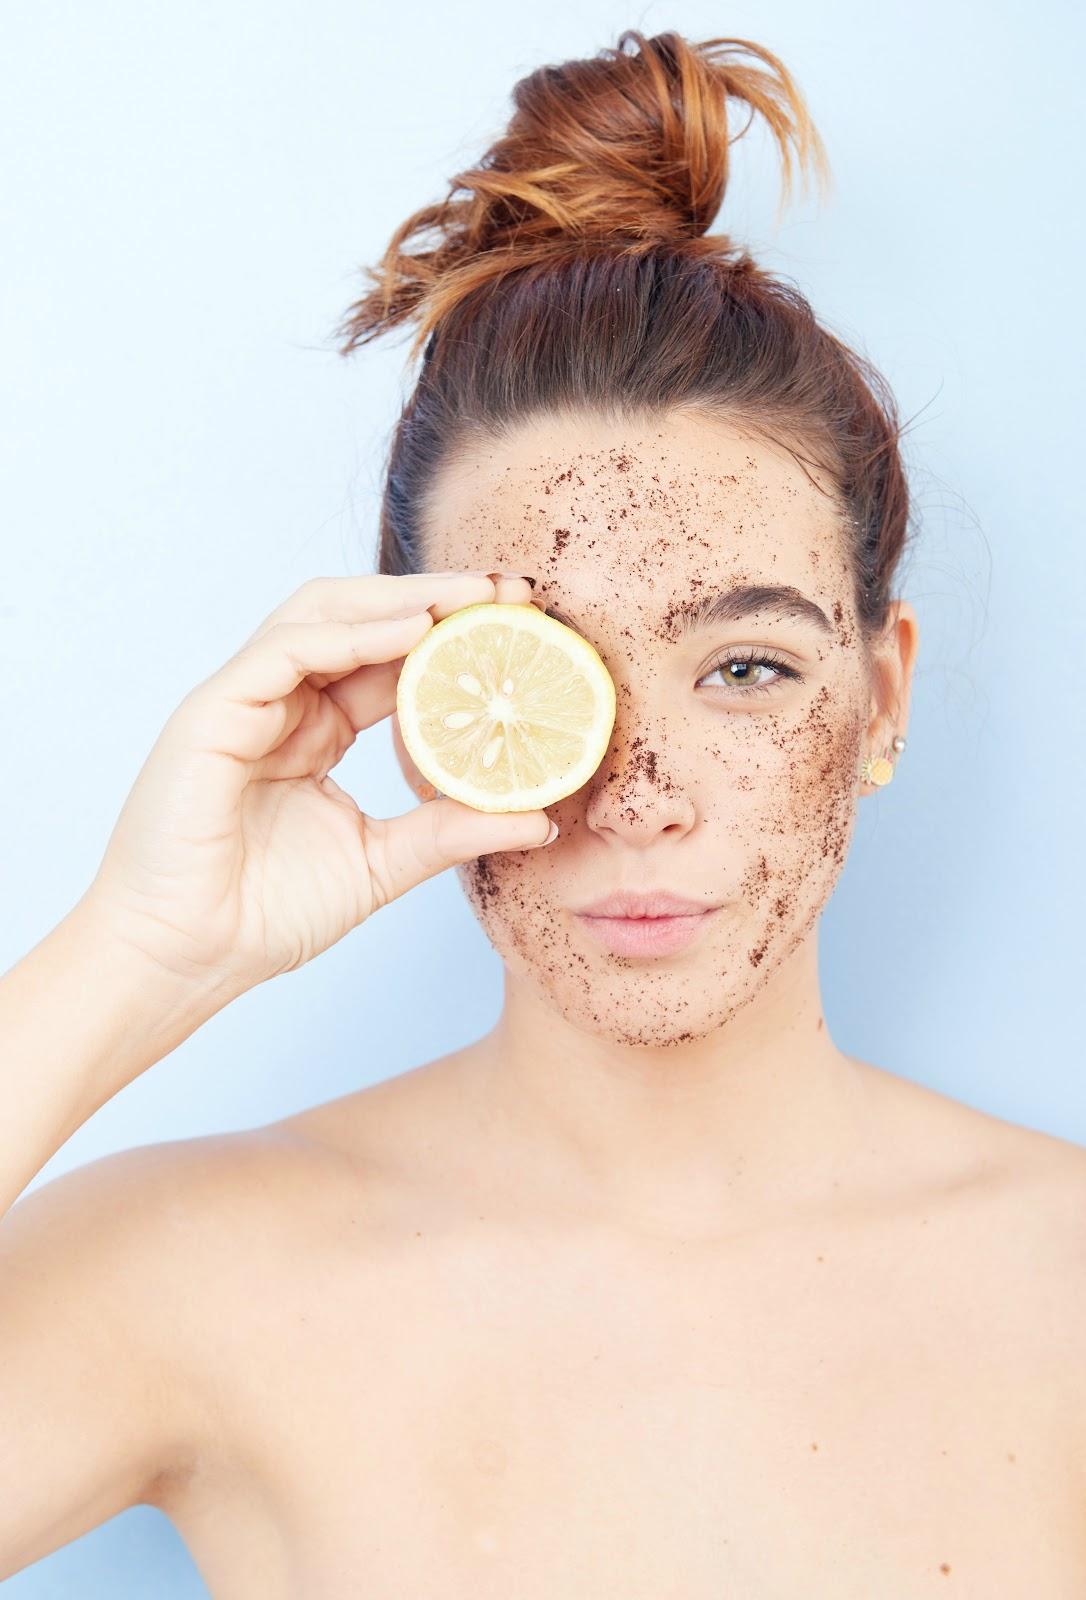 Facial Scrub Skin Exfoliating